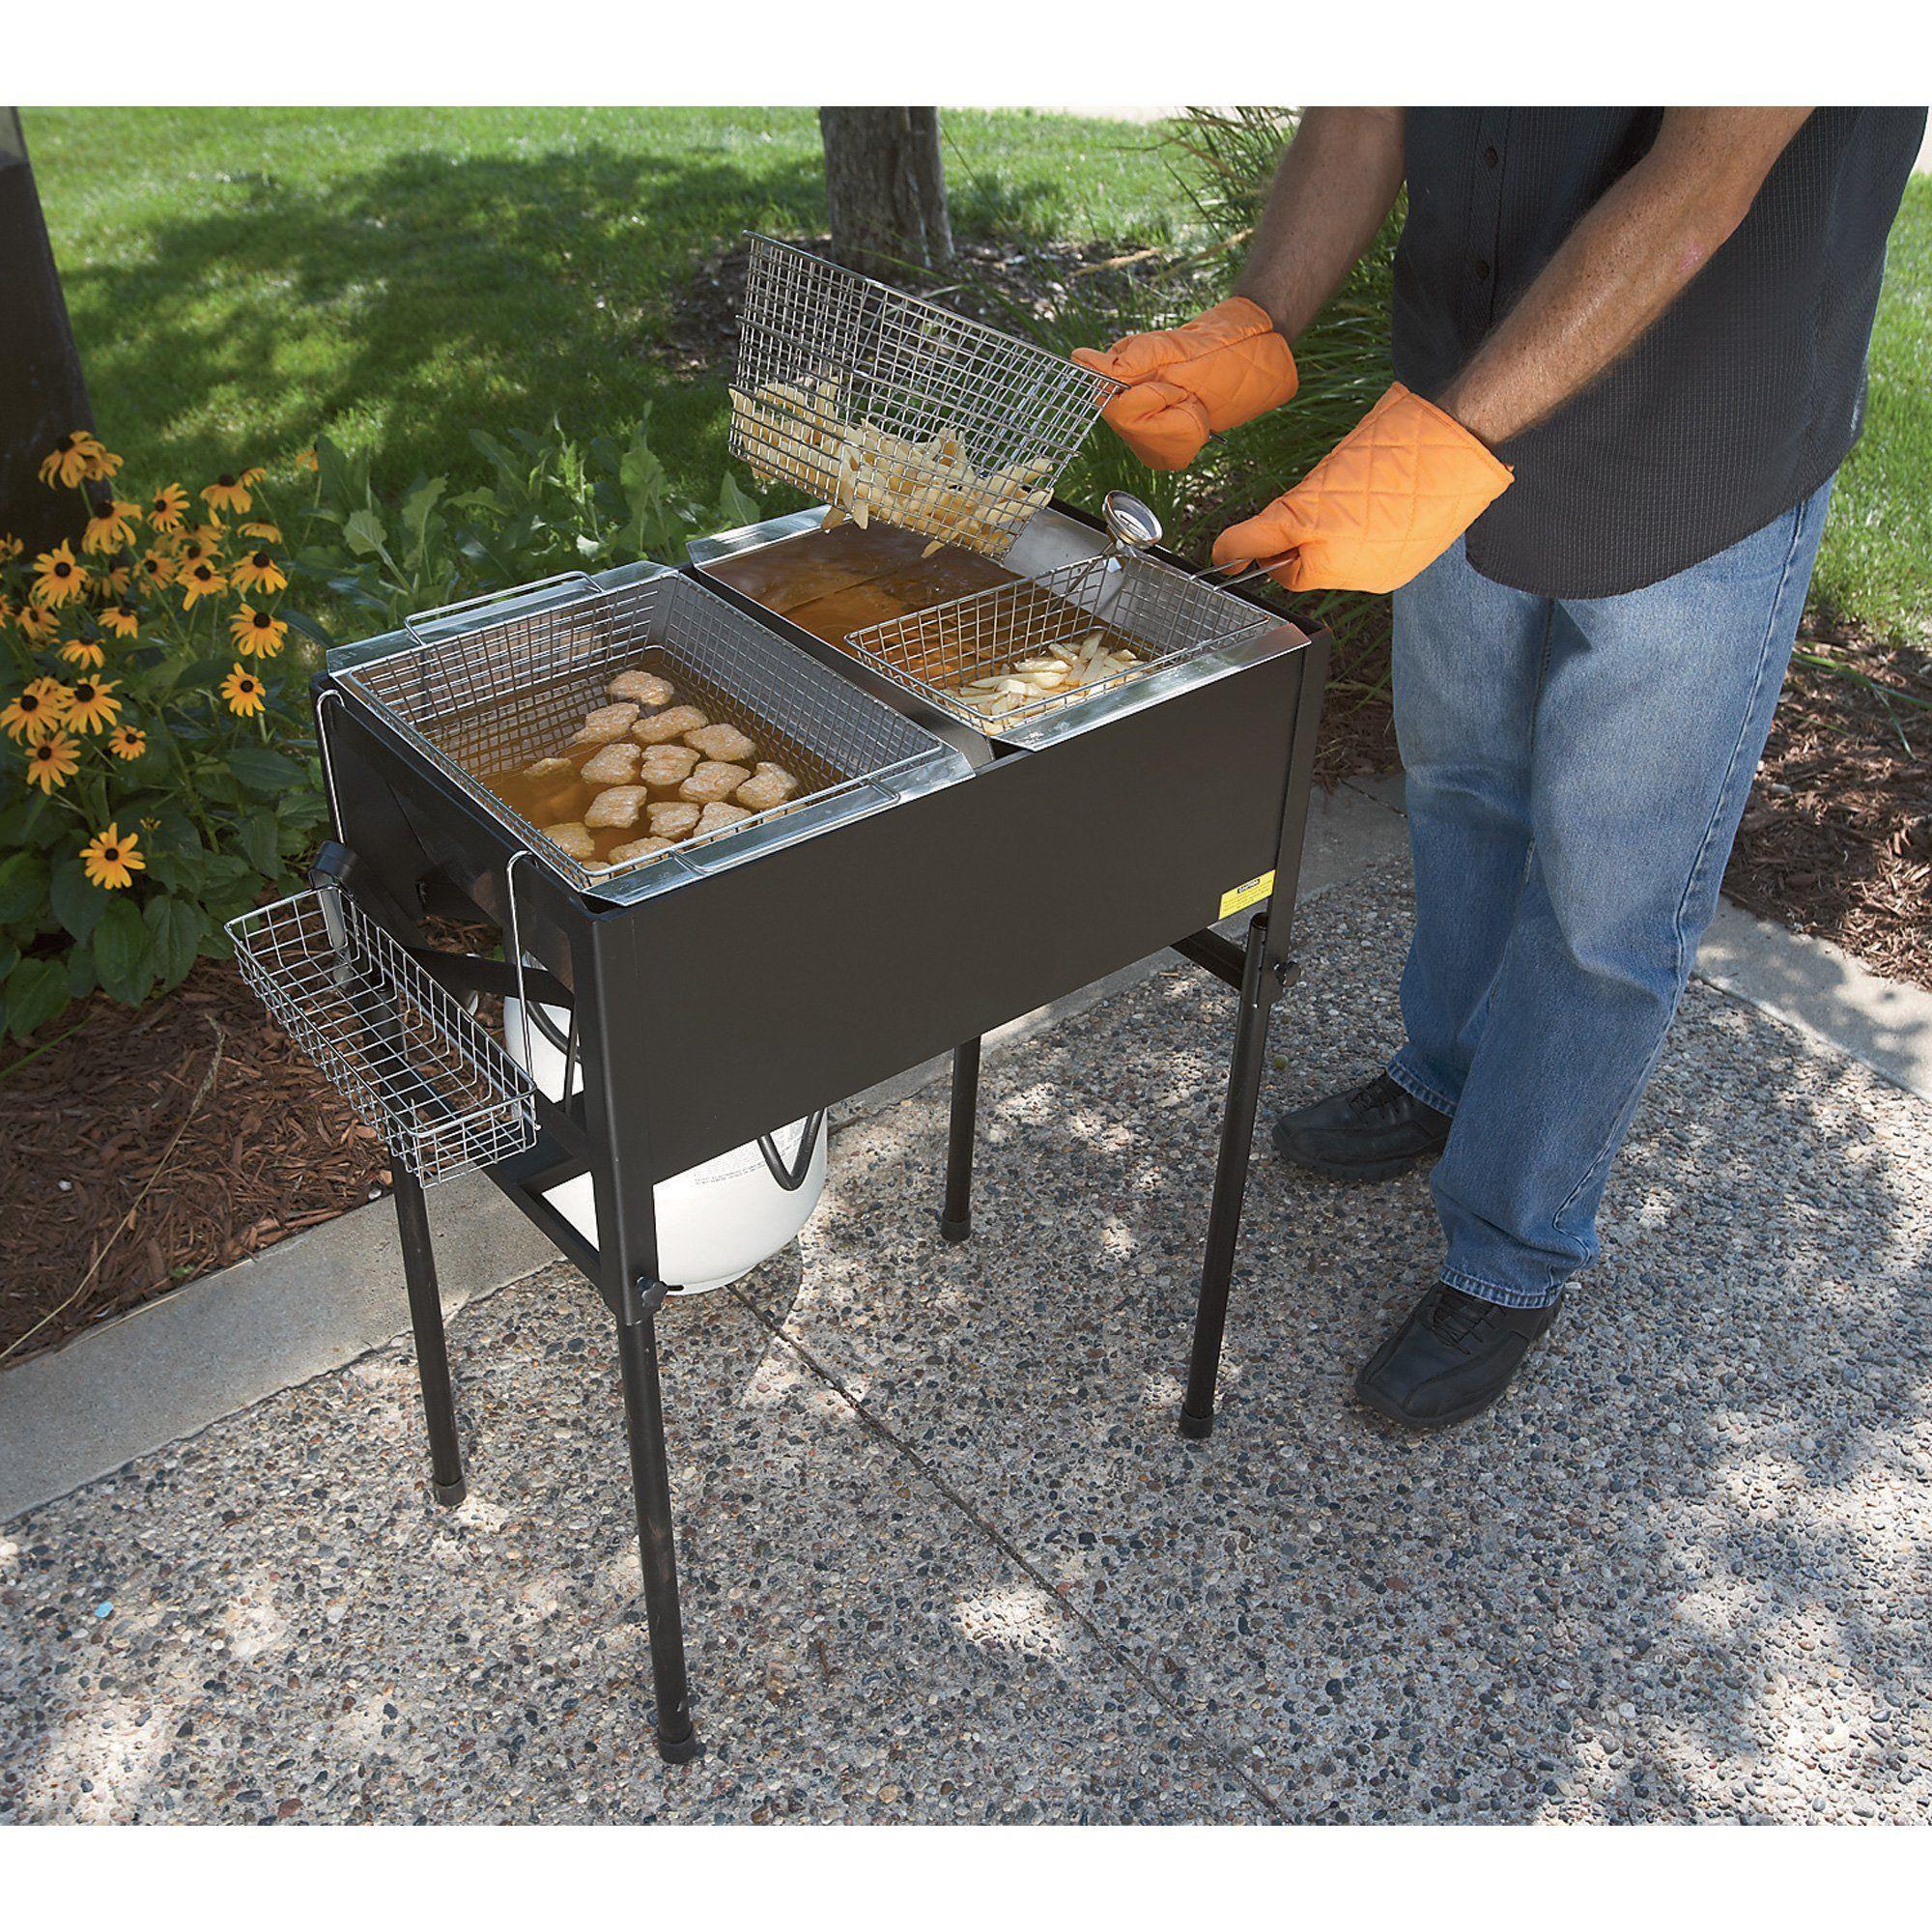 kitchener triple basket deep fryer unique kitchen countertops three outdoor propane kotulas